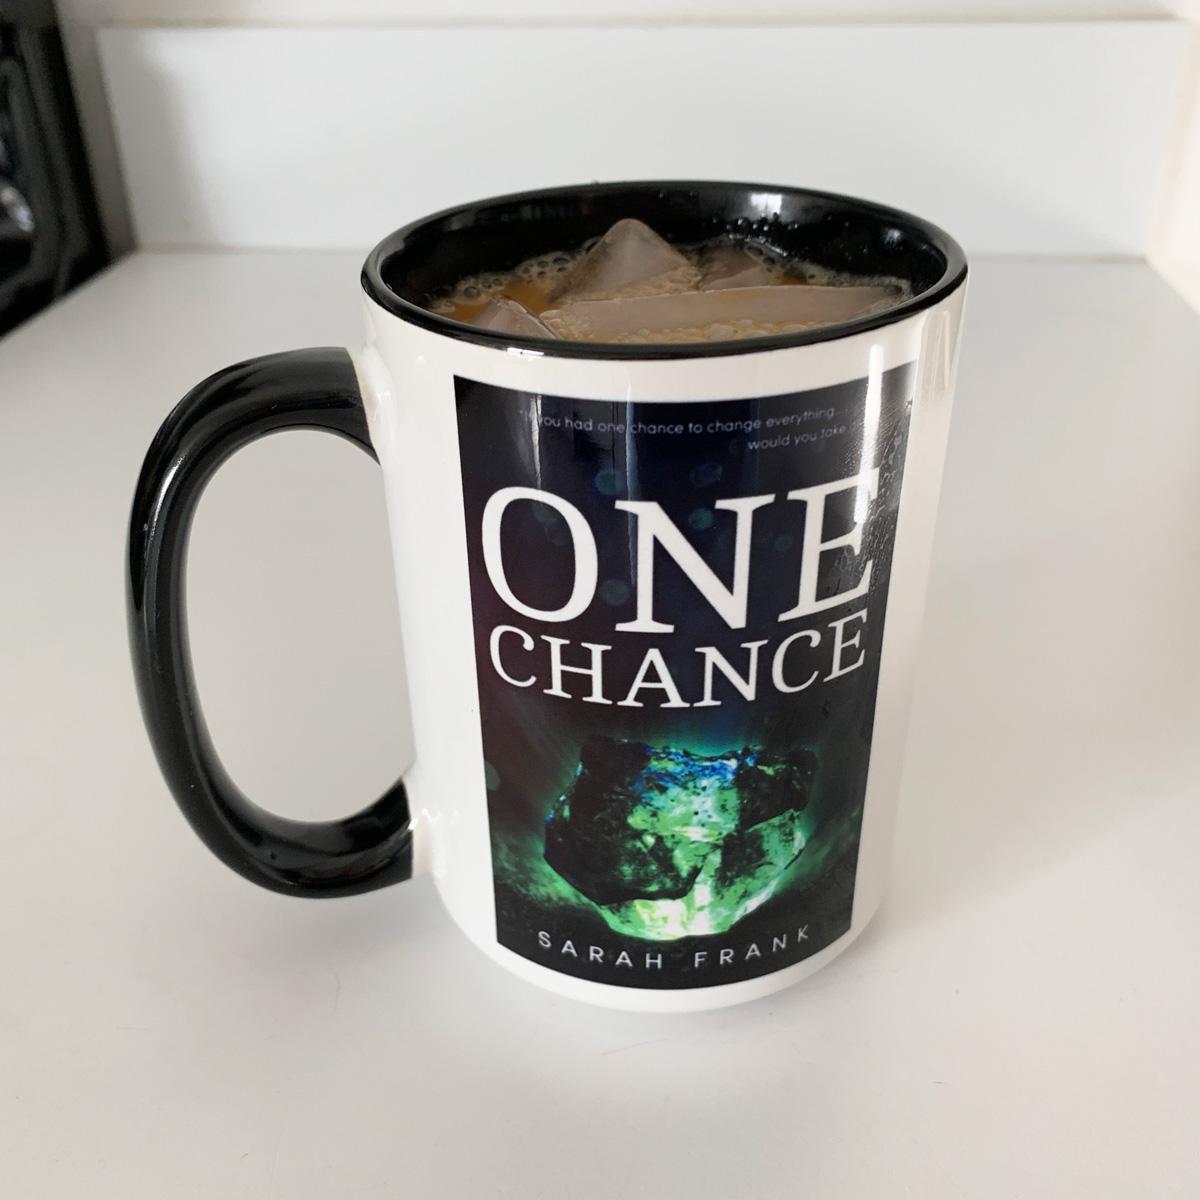 CT_One-Chance-Mug.jpg